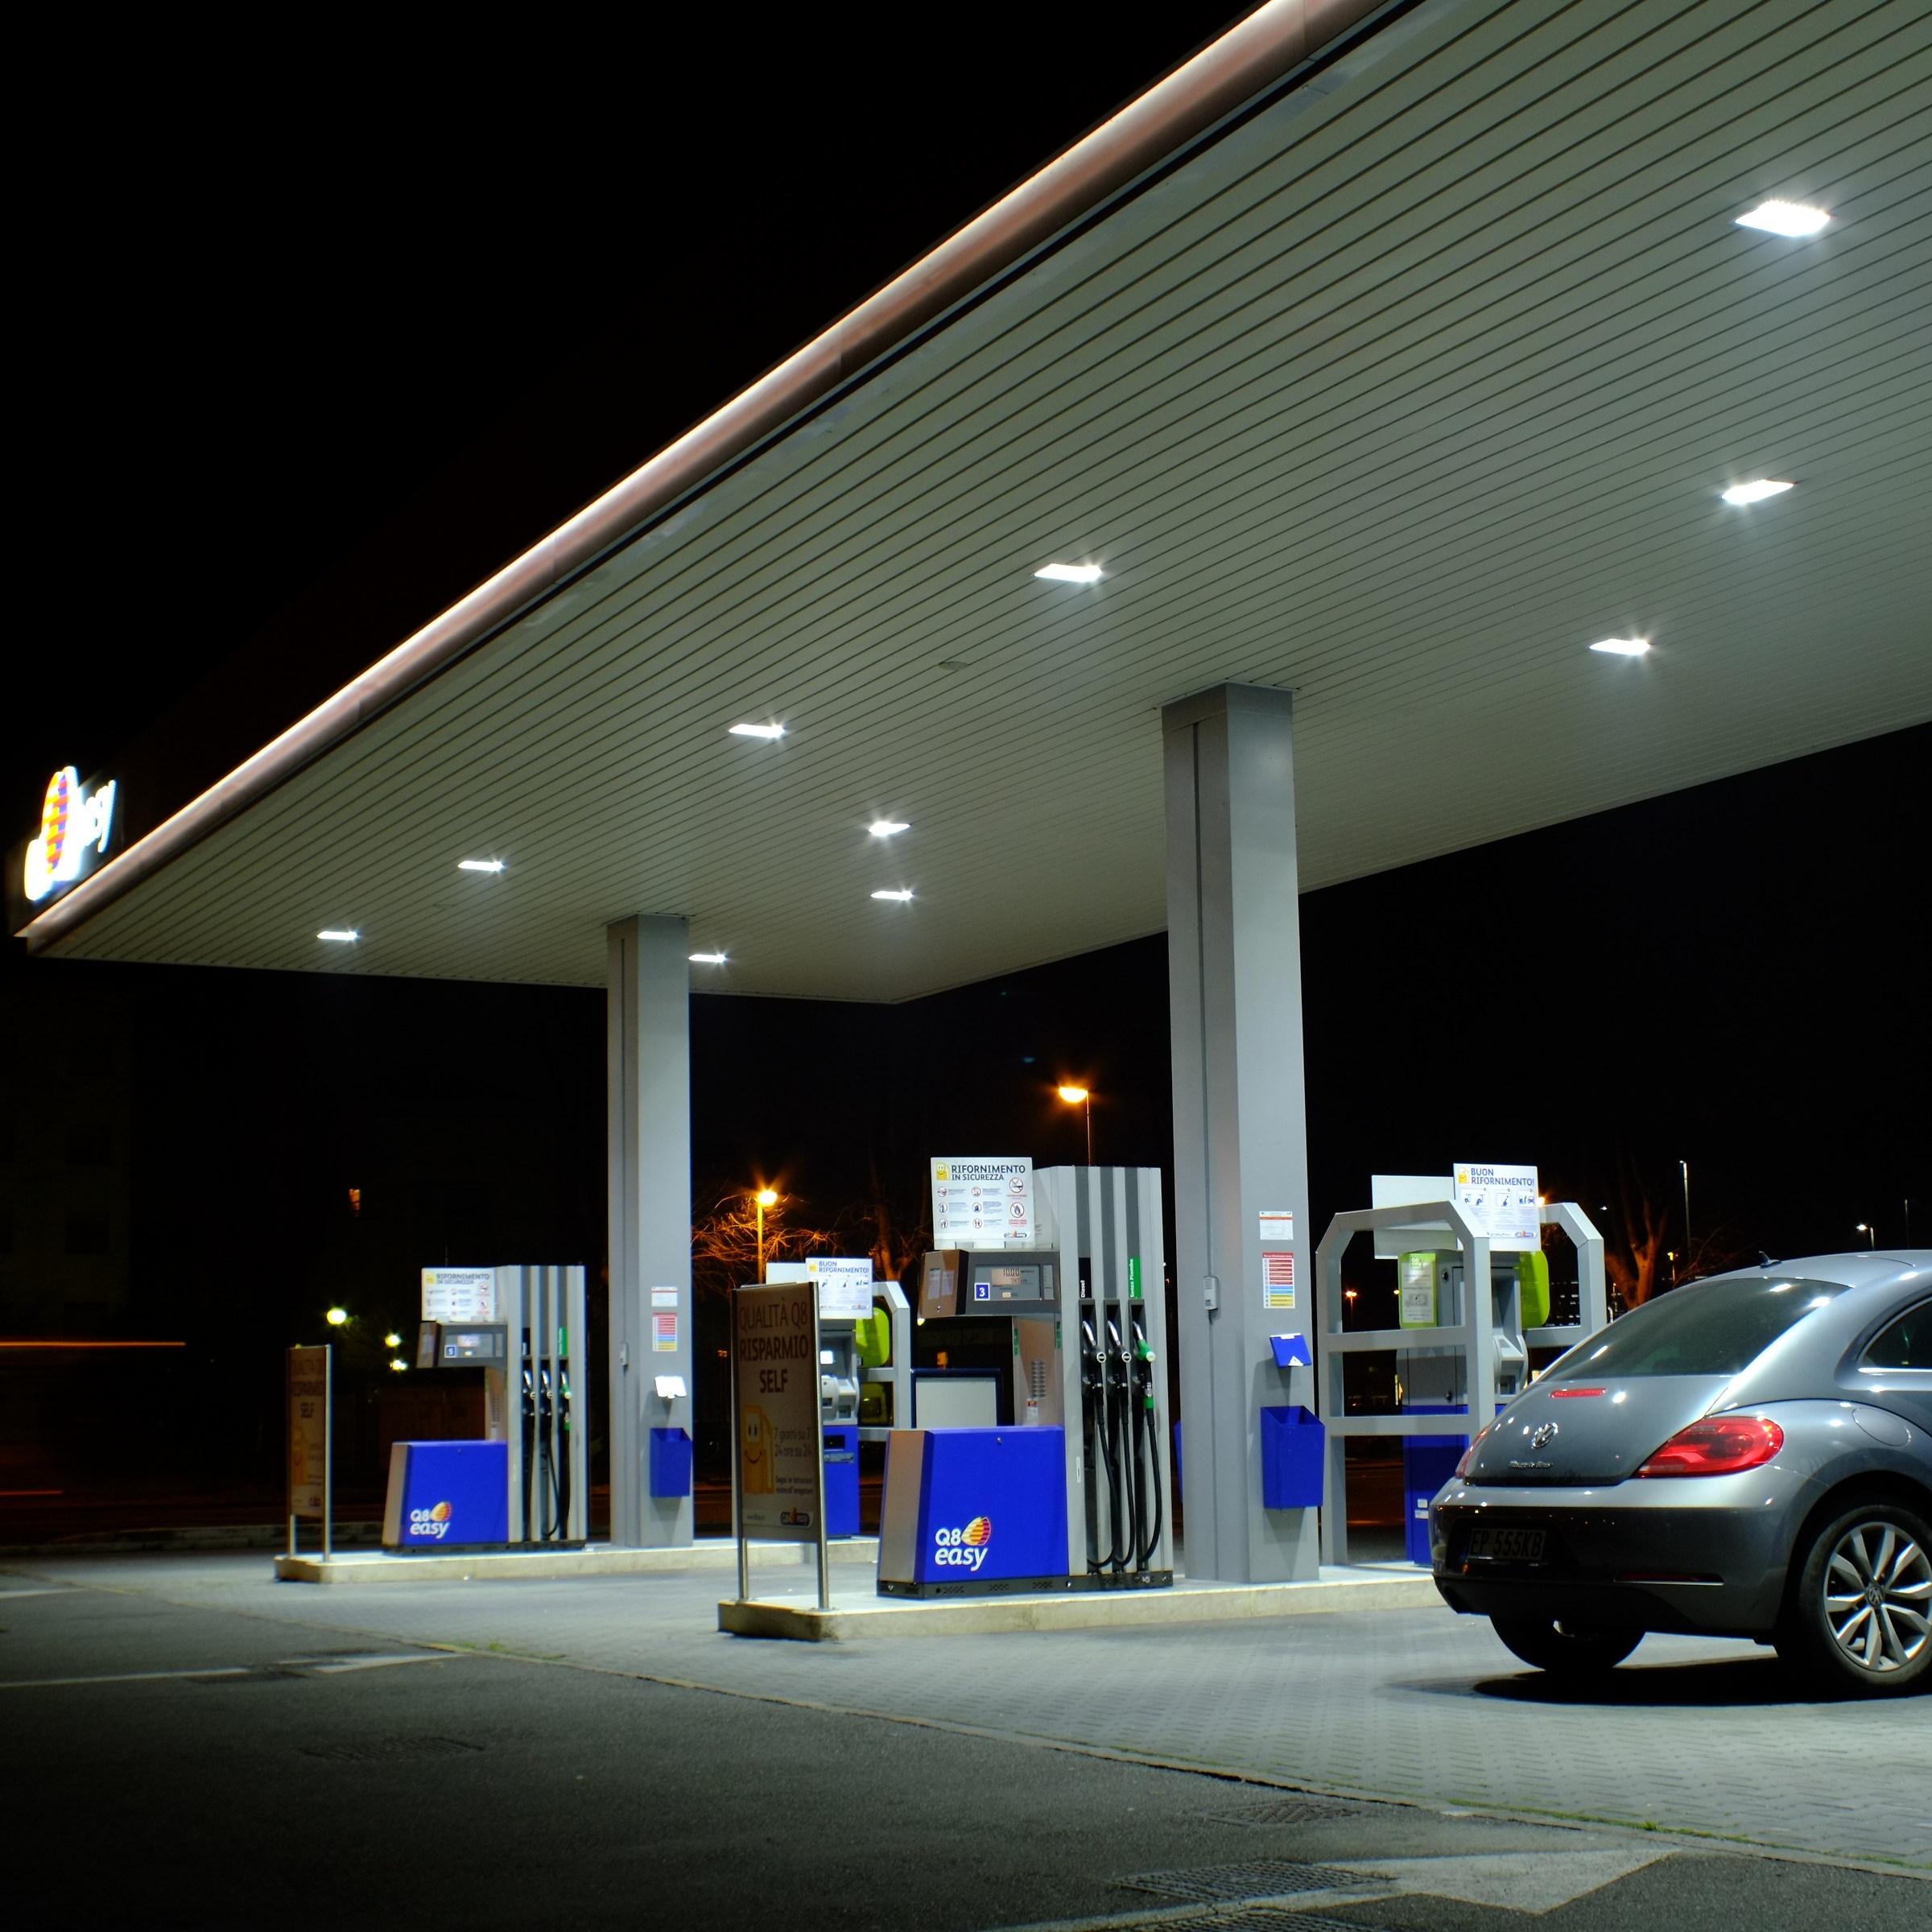 Gas station at night...